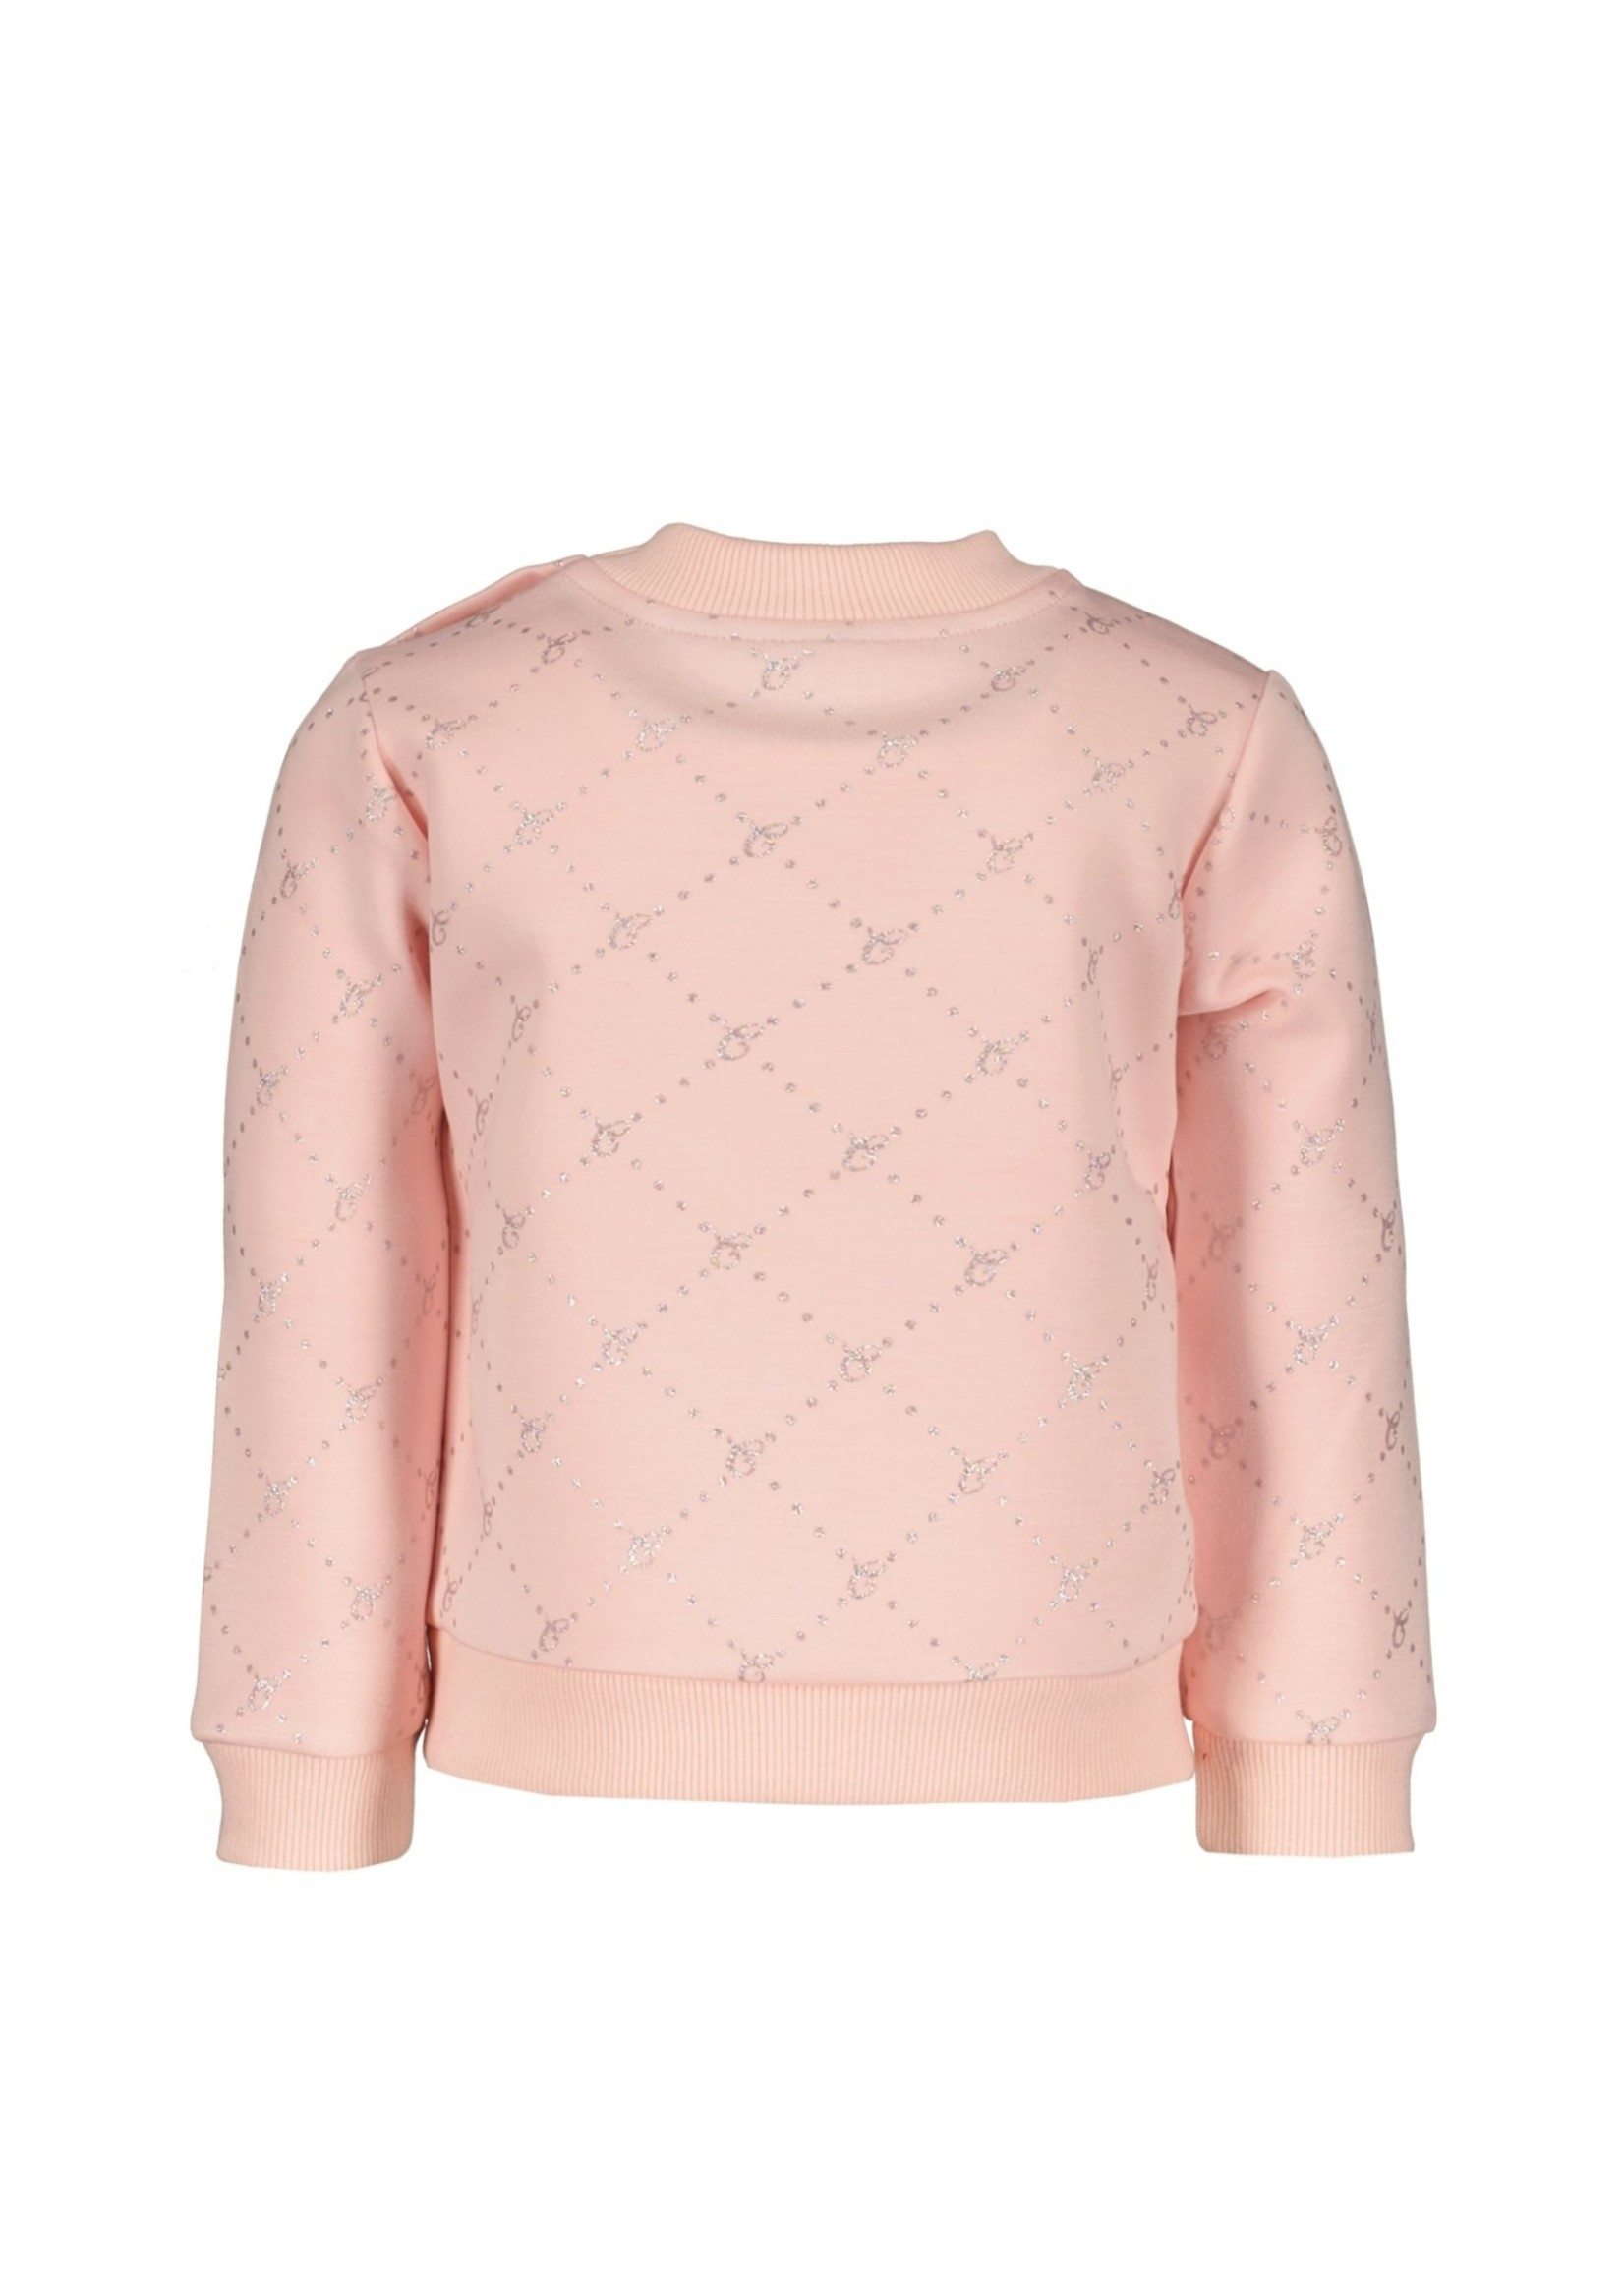 "Le Chic LE CHIC Sweater ""Odette"" glitter pink"